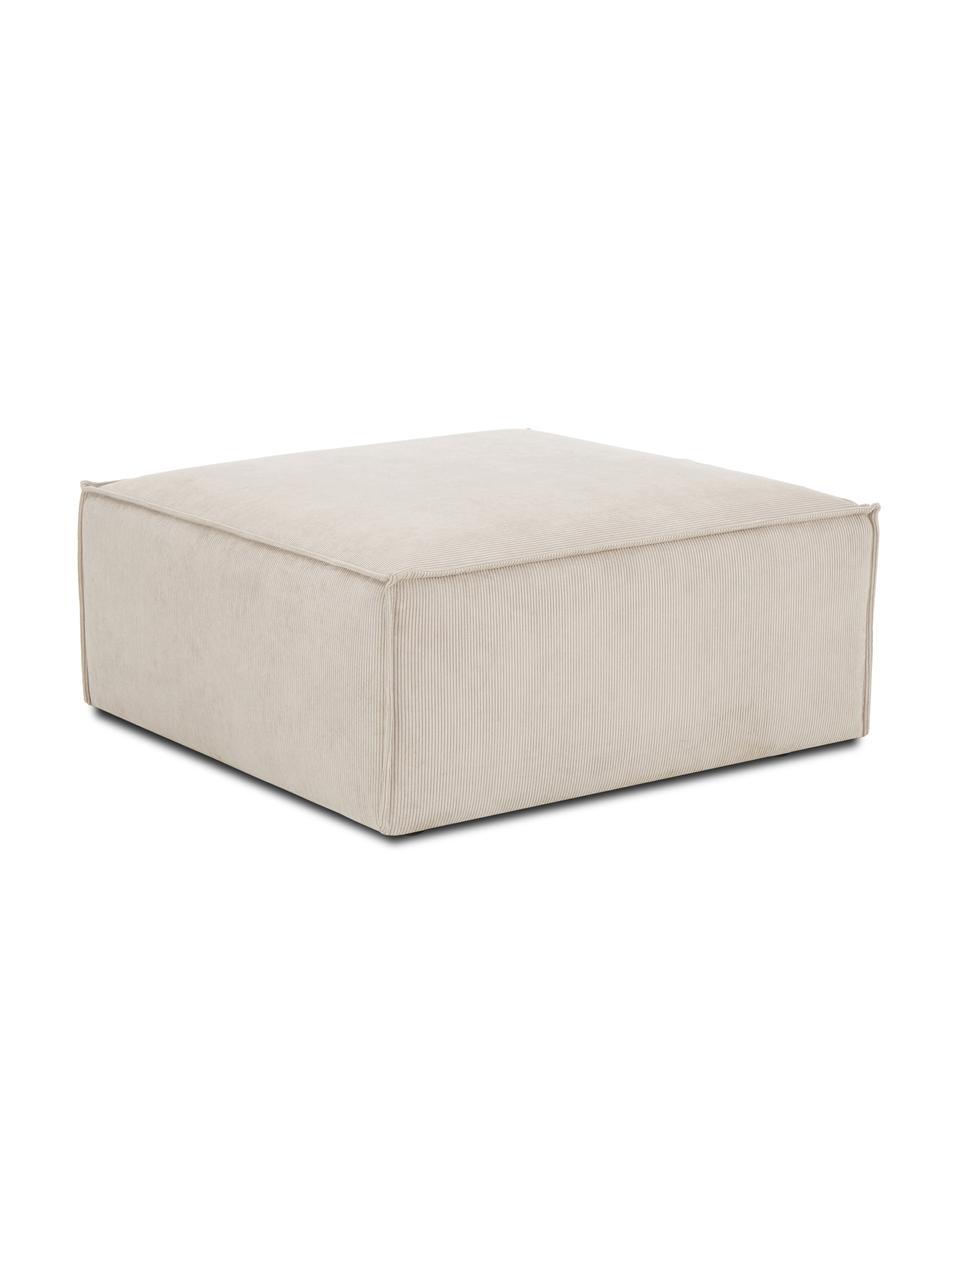 Sofa-Hocker Lennon in Beige aus Cord, Bezug: Cord (92% Polyester, 8% P, Gestell: Massives Kiefernholz, Spe, Füße: Kunststoff Die Füße befin, Cord Beige, 88 x 43 cm